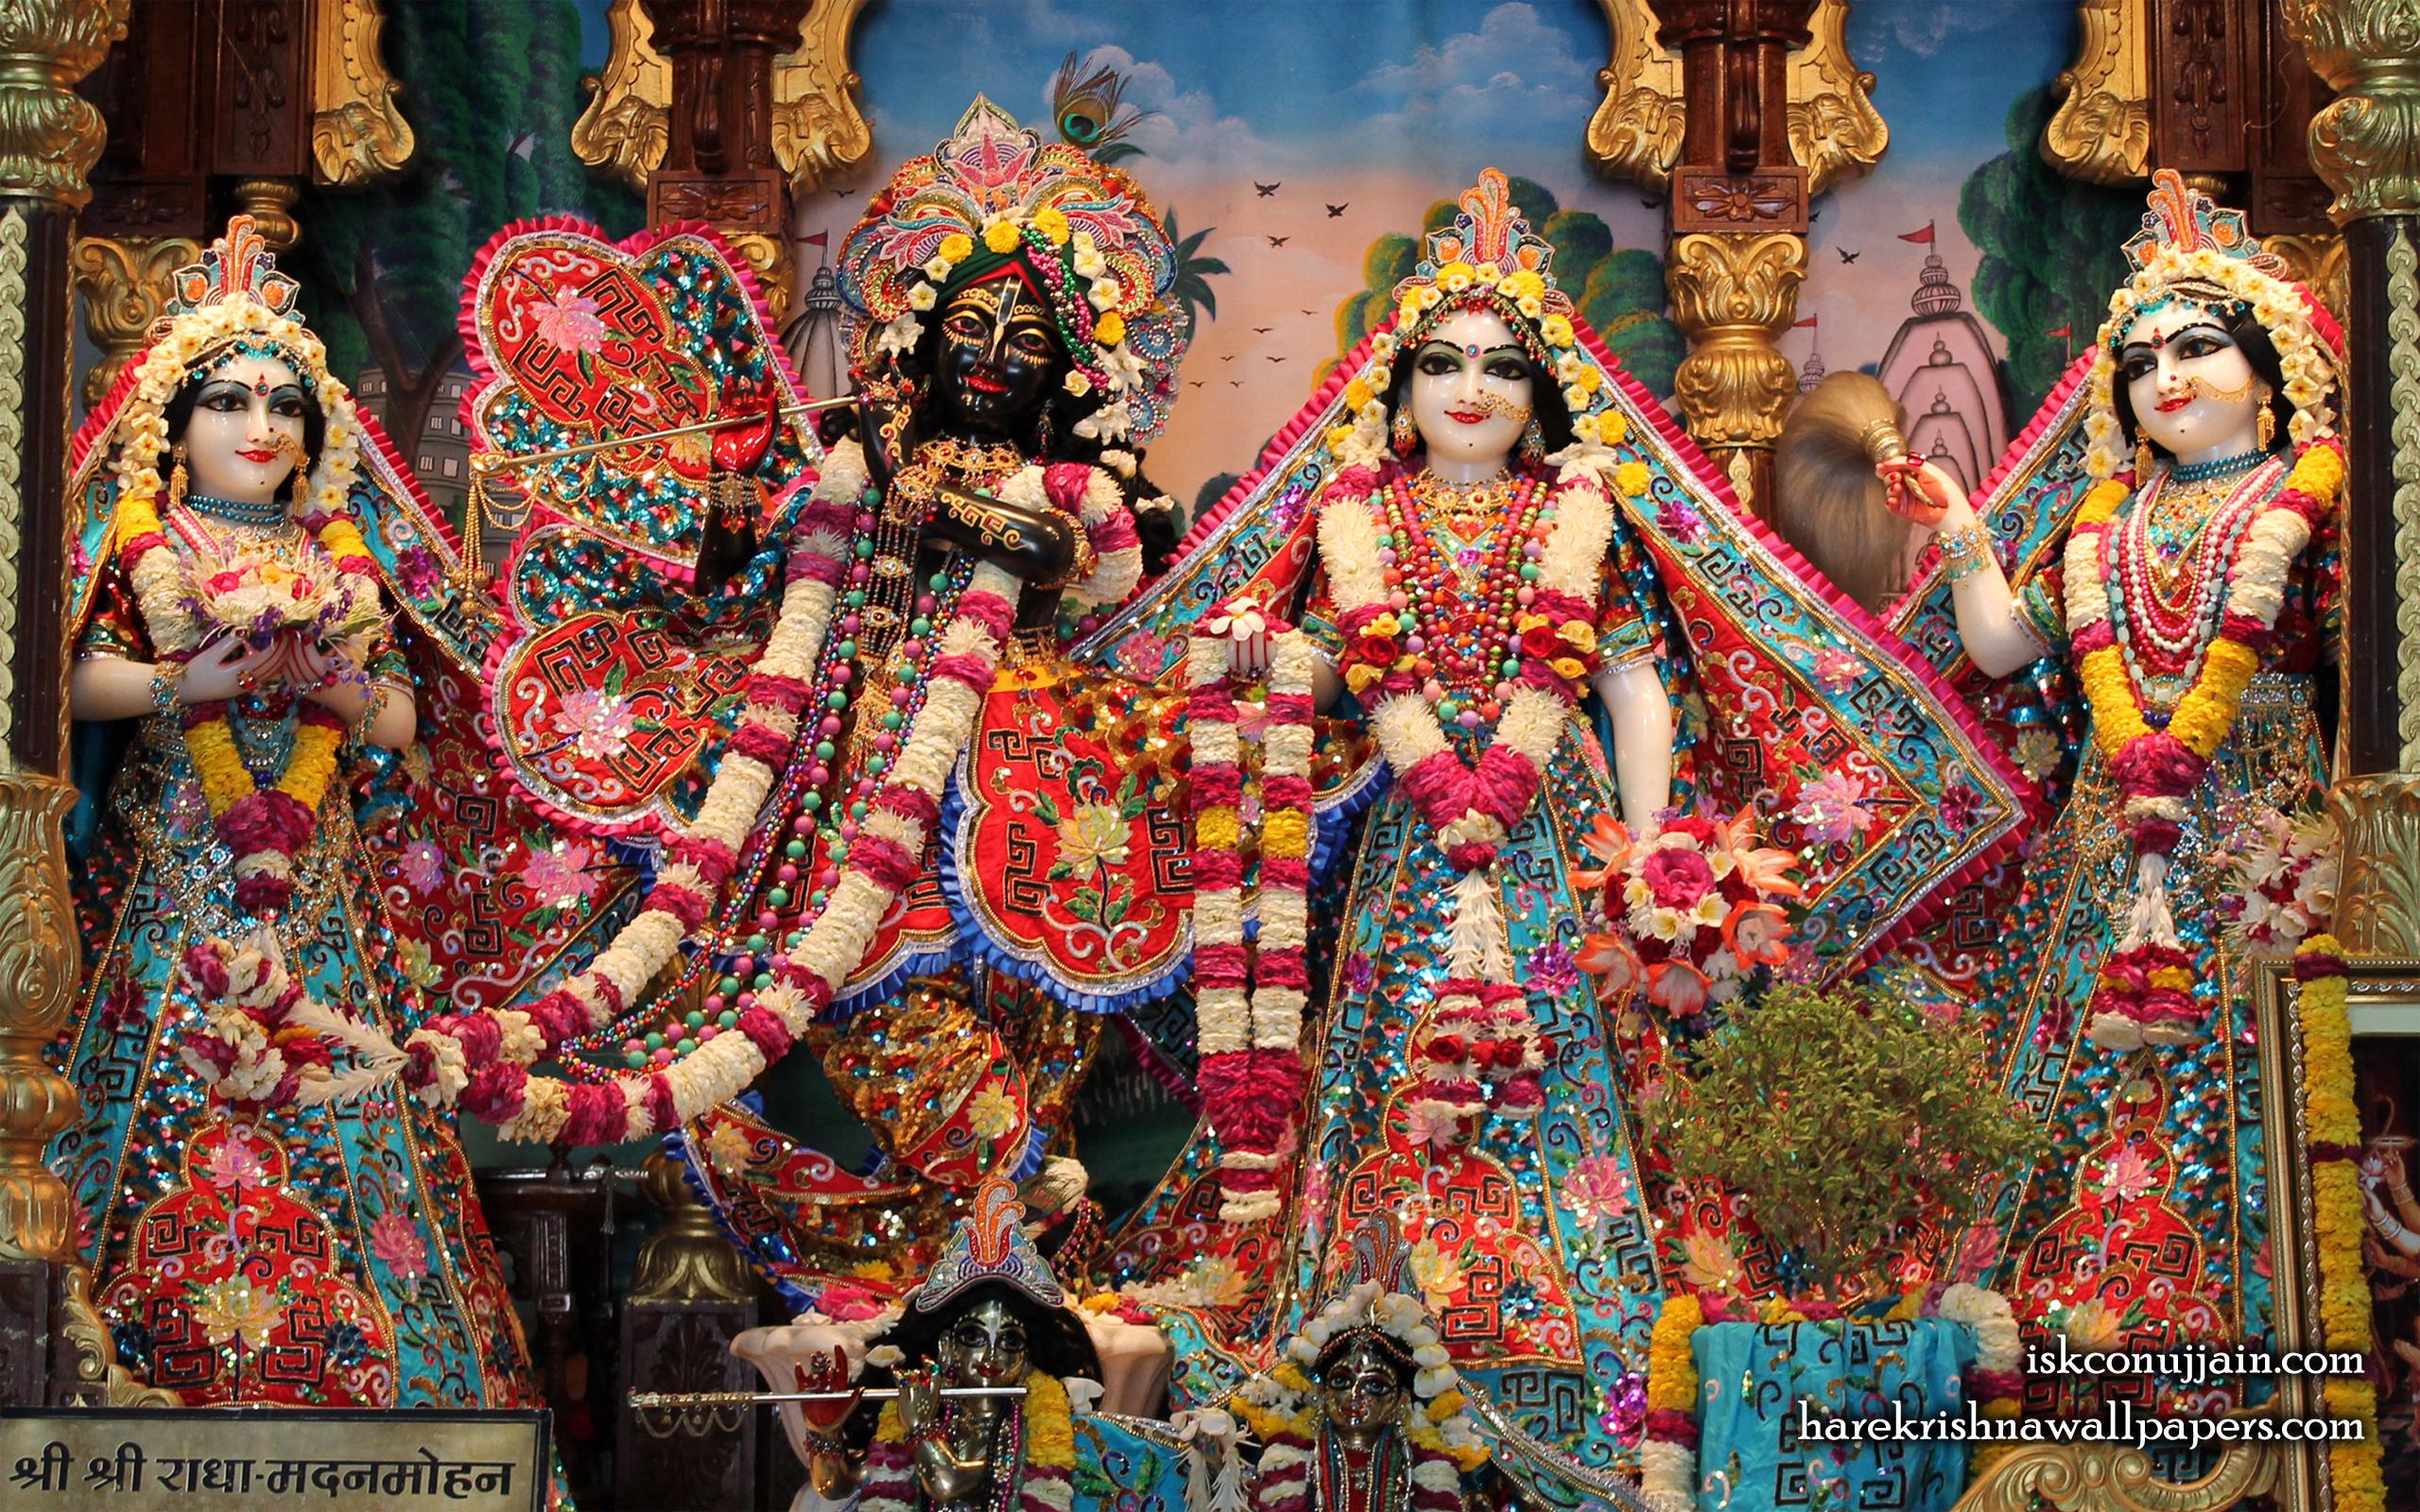 Sri Sri Radha Madanmohan Lalita Vishakha Wallpaper (004) Size 2560x1600 Download